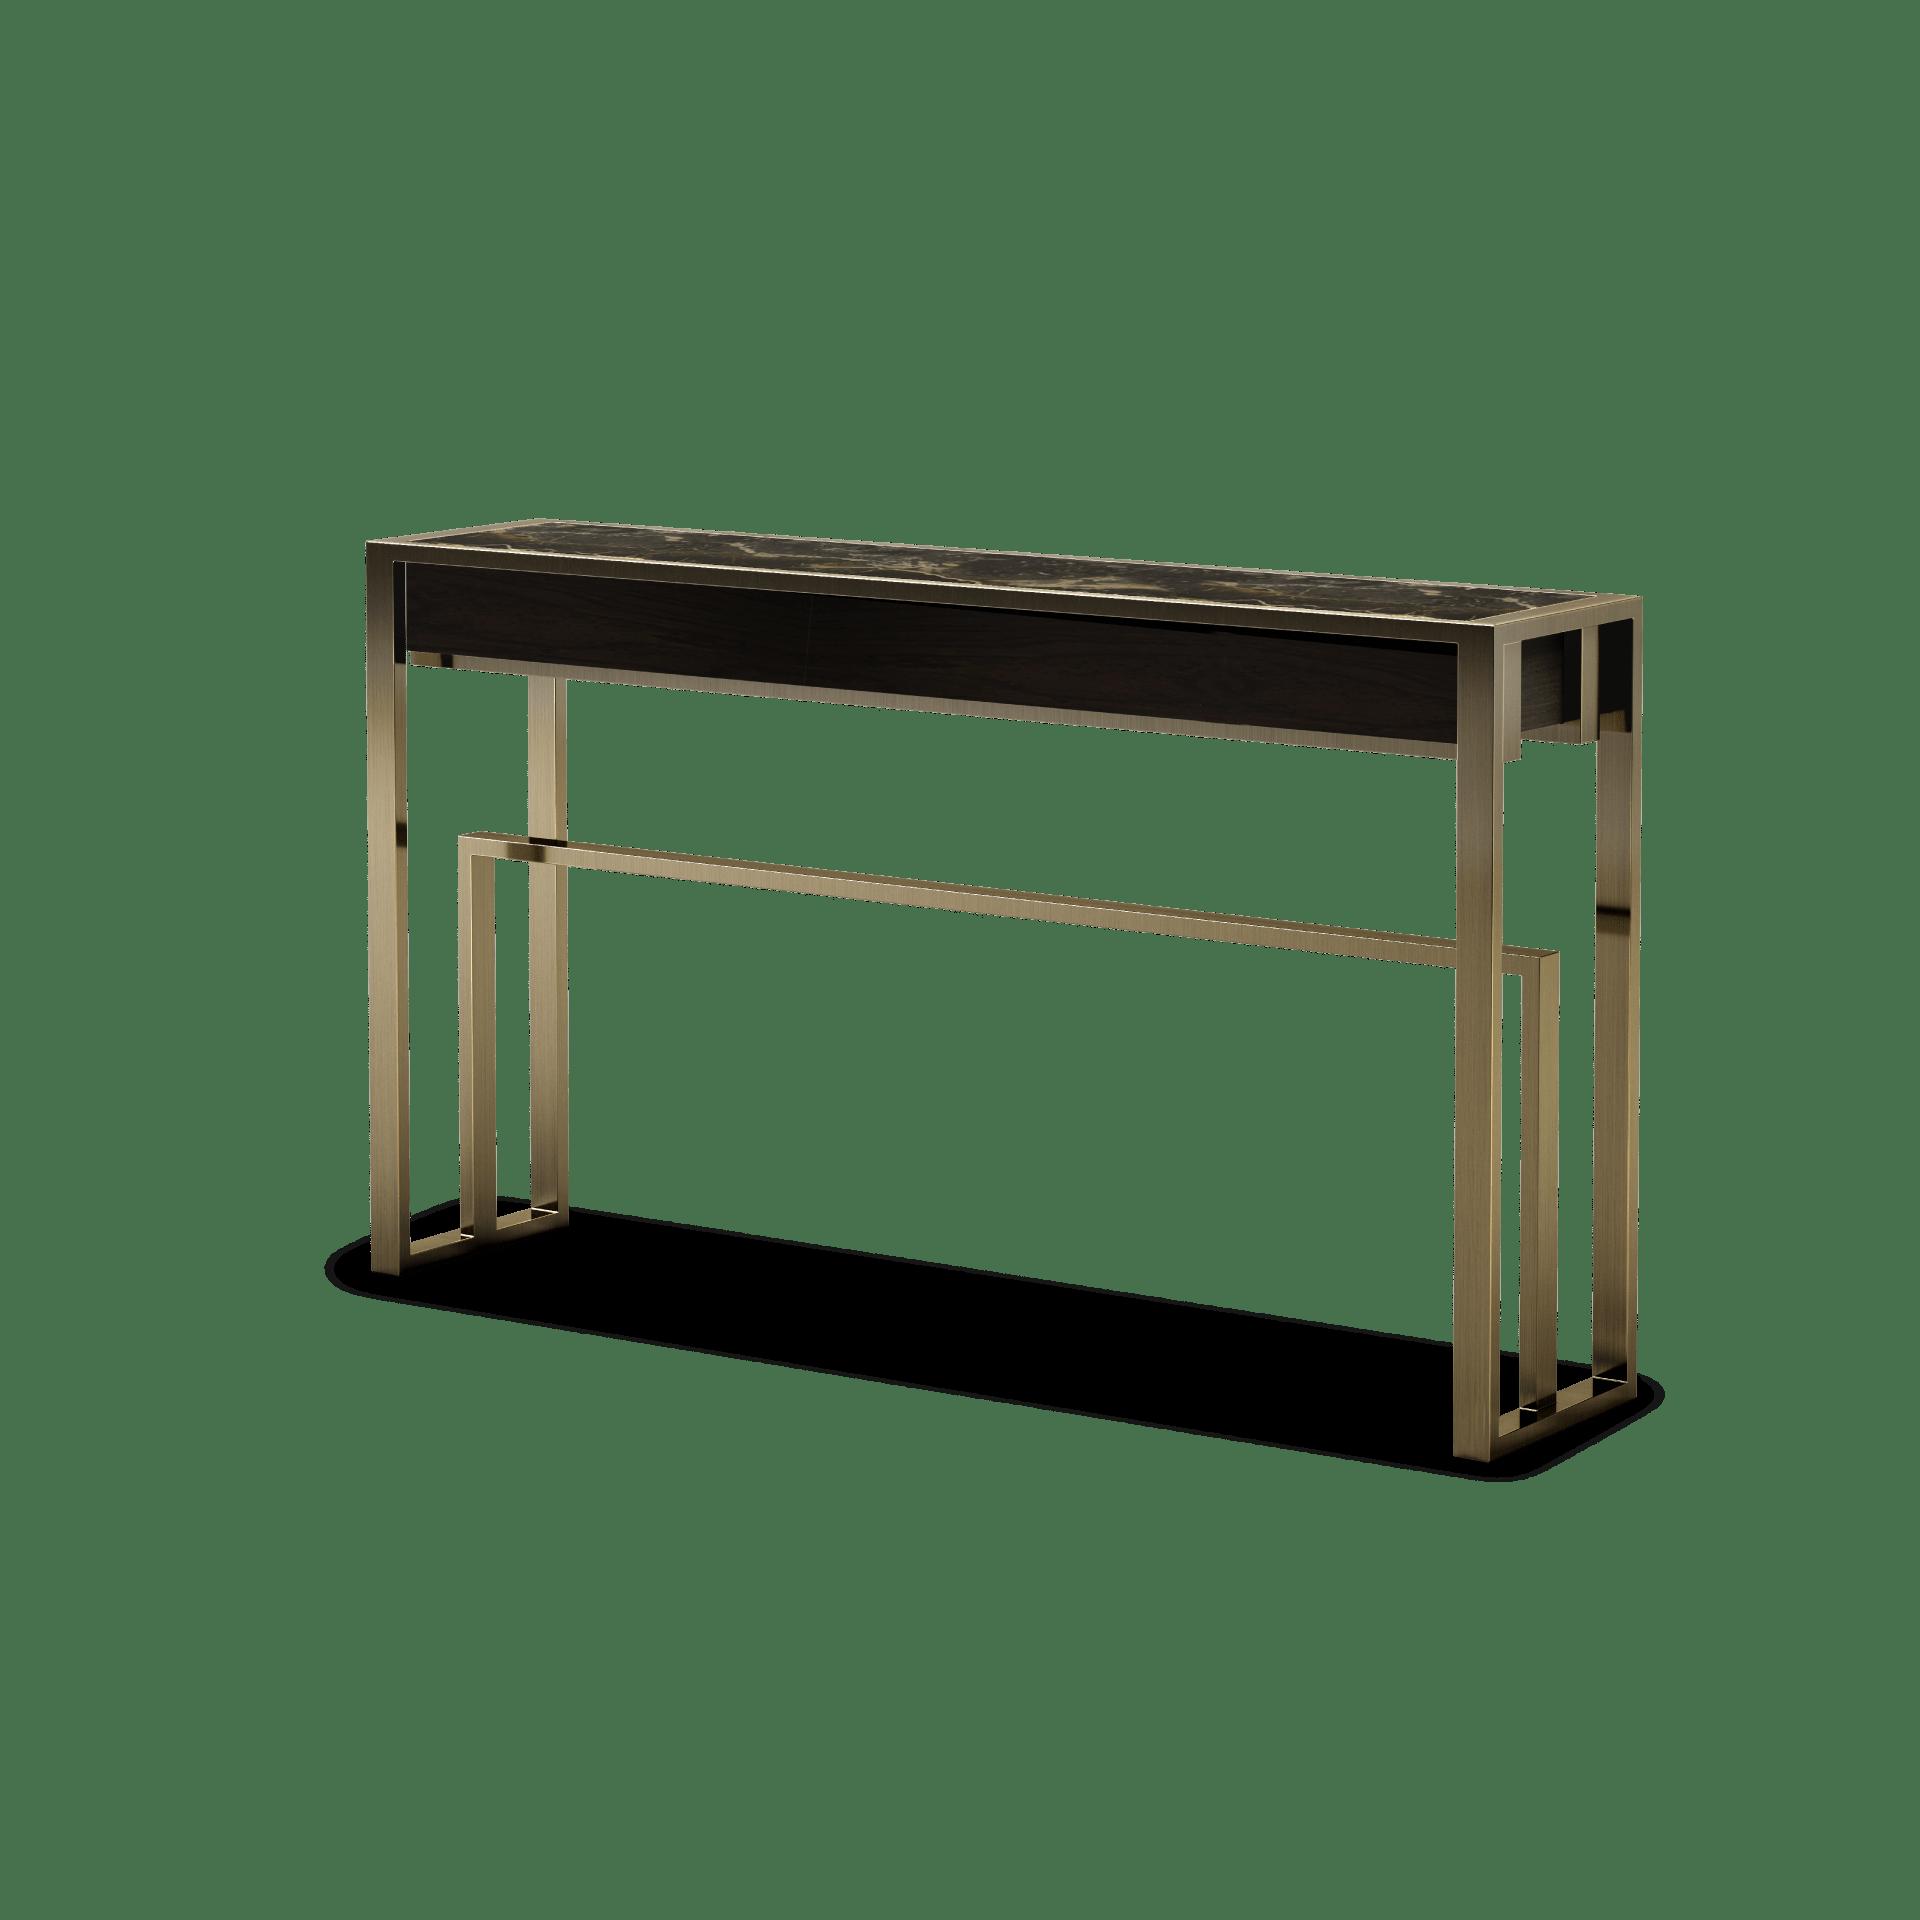 Sutter Modern Console By Porus Studio Contemporary Furniture In 2020 Contemporary Modern Furniture Contemporary Furniture Contemporary House Design